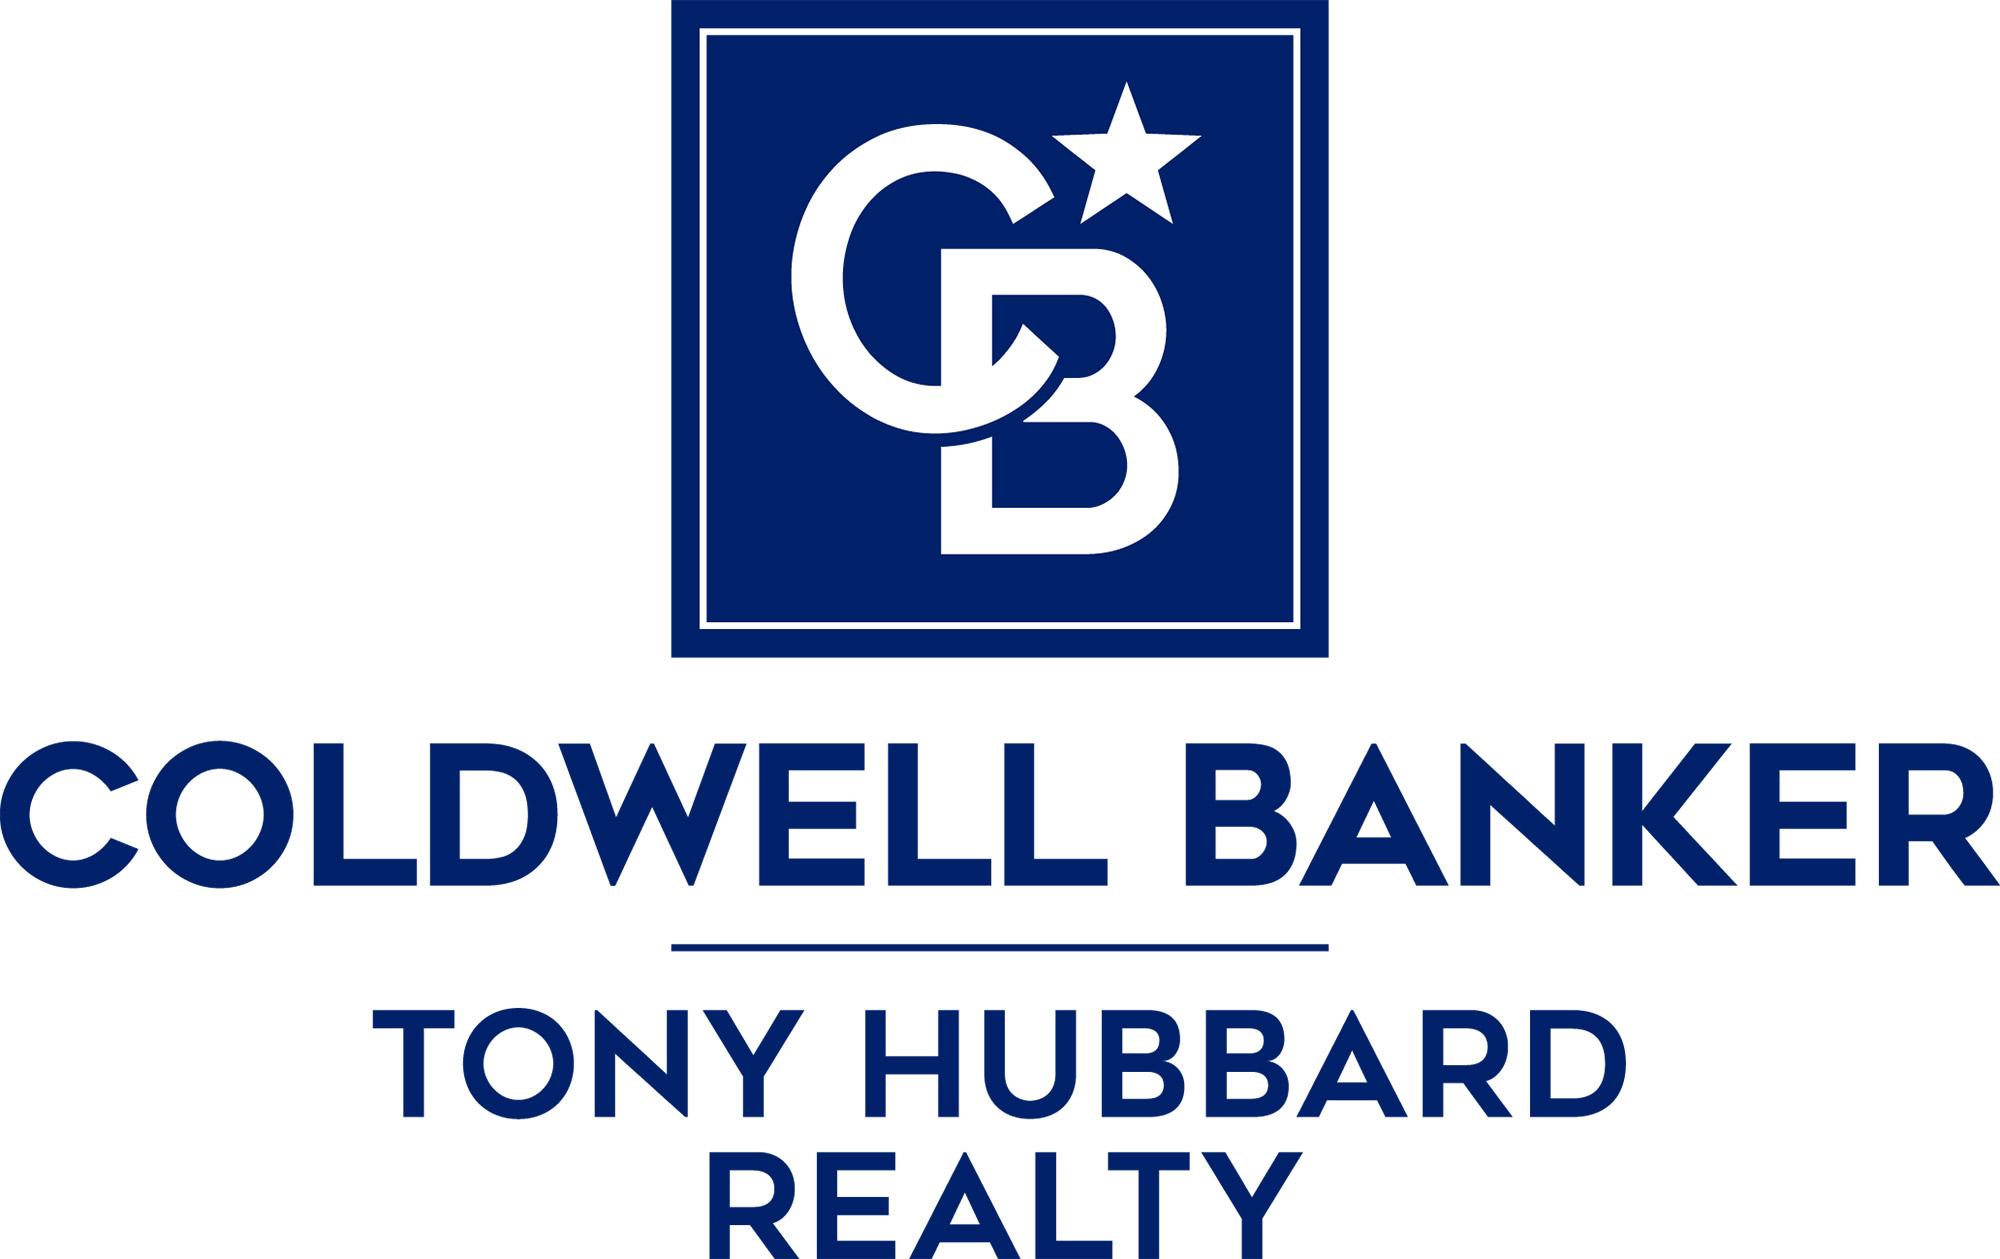 Vicki Thomas - Coldwell Banker Tony Hubbard Logo